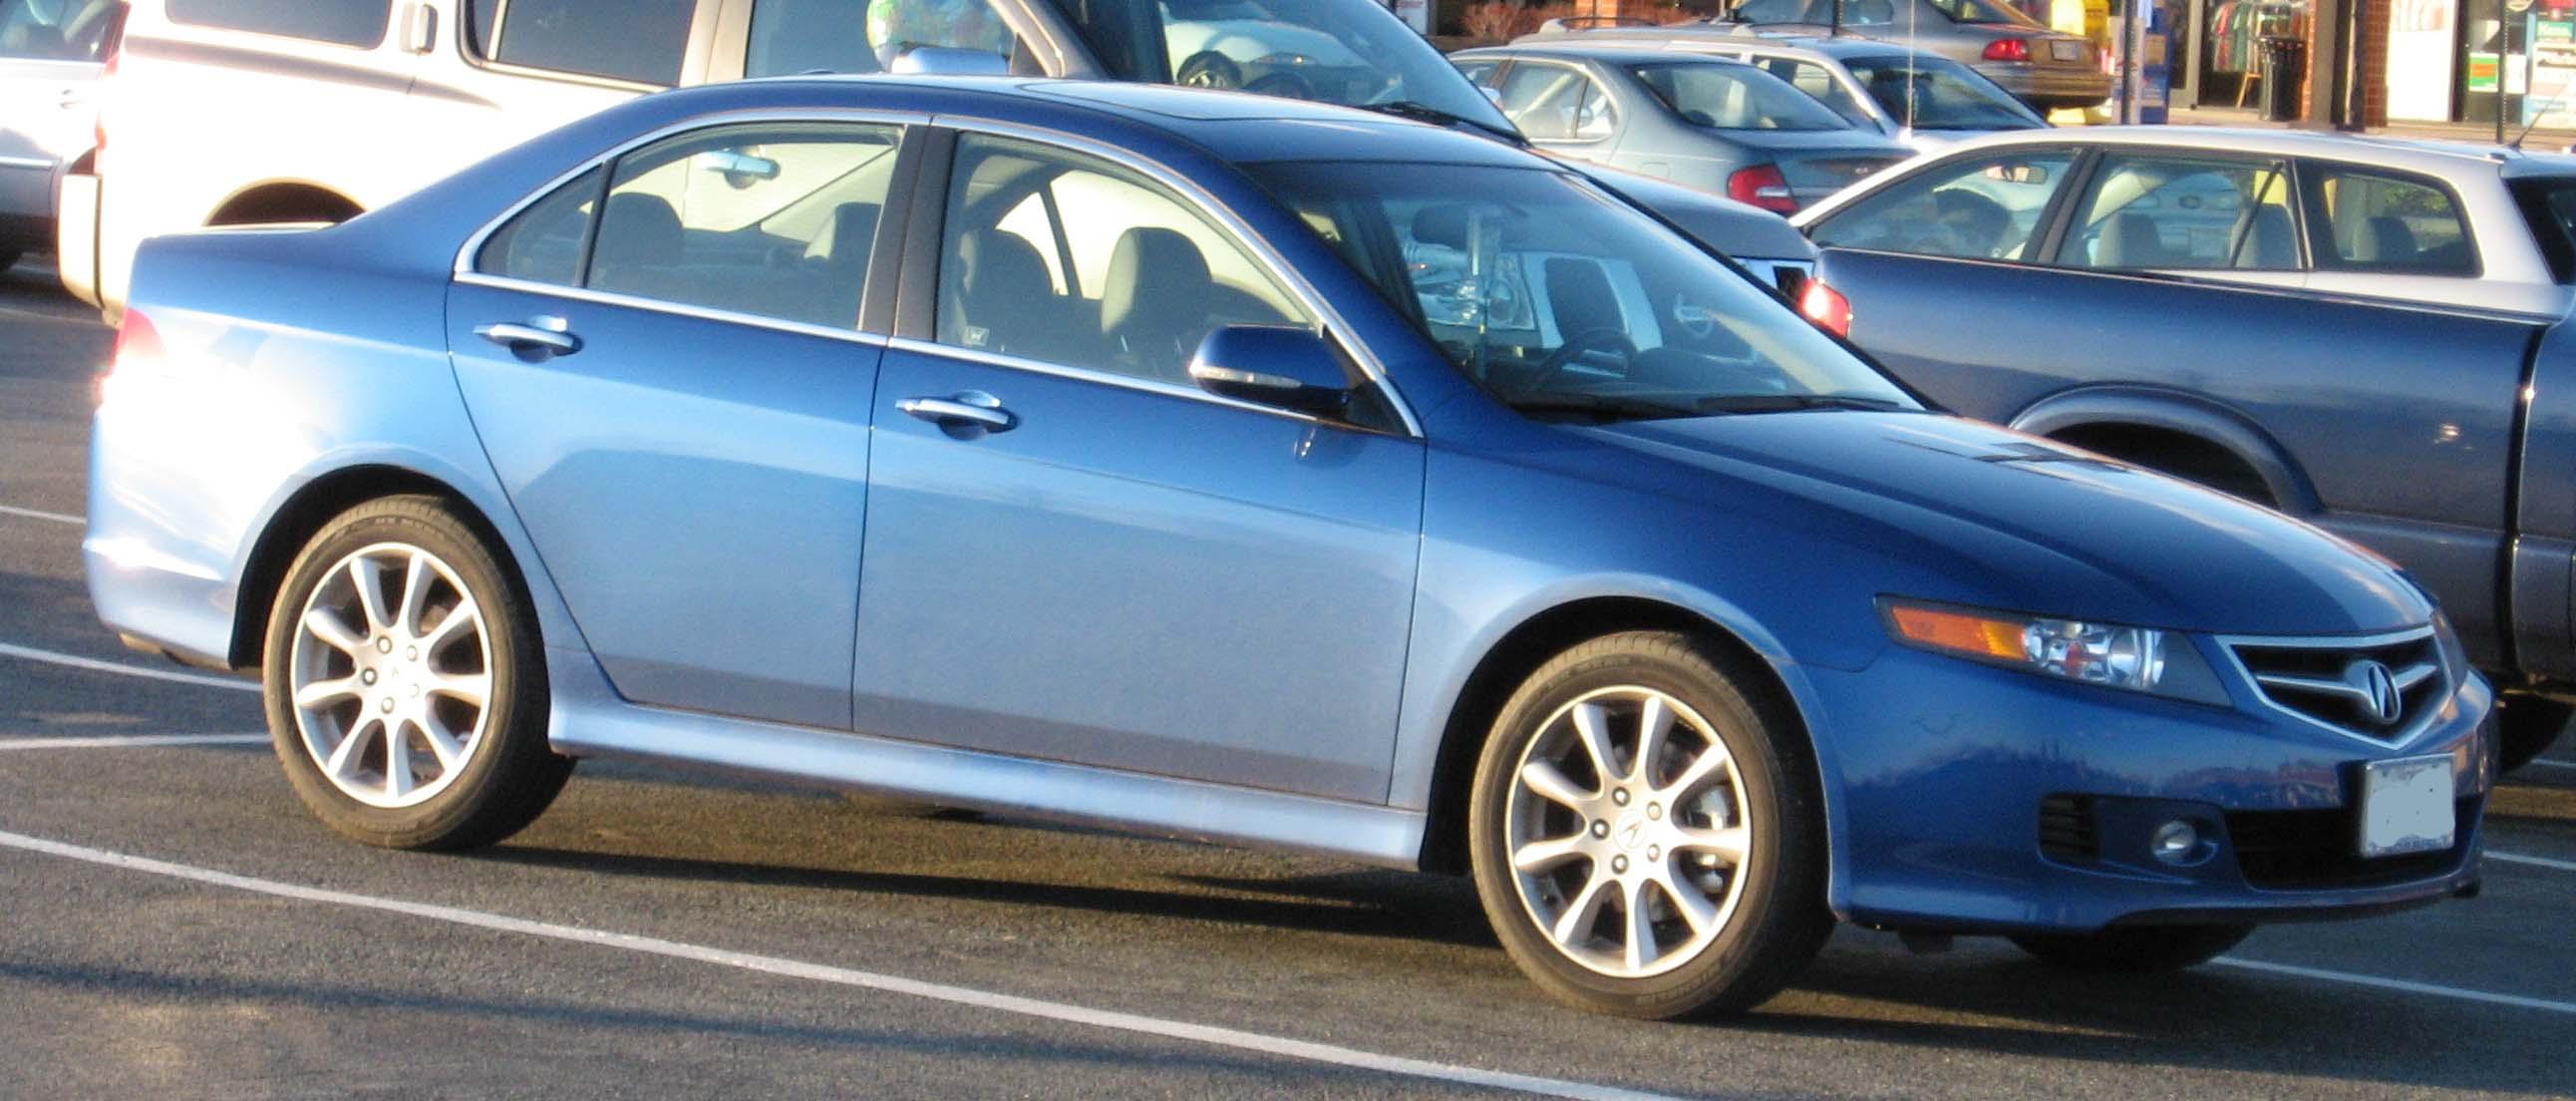 https://upload.wikimedia.org/wikipedia/commons/7/72/07-Acura-TSX.jpg